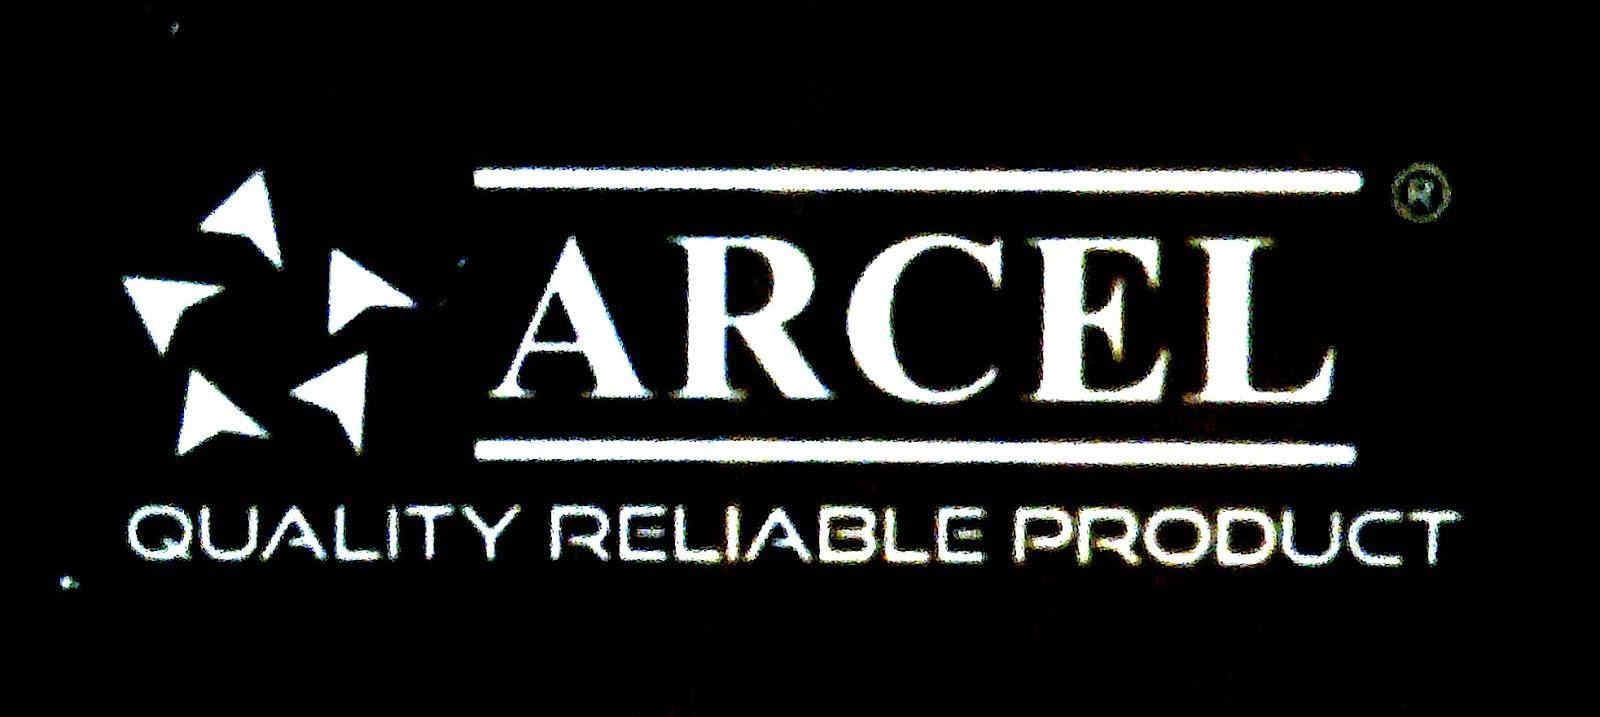 Arcel